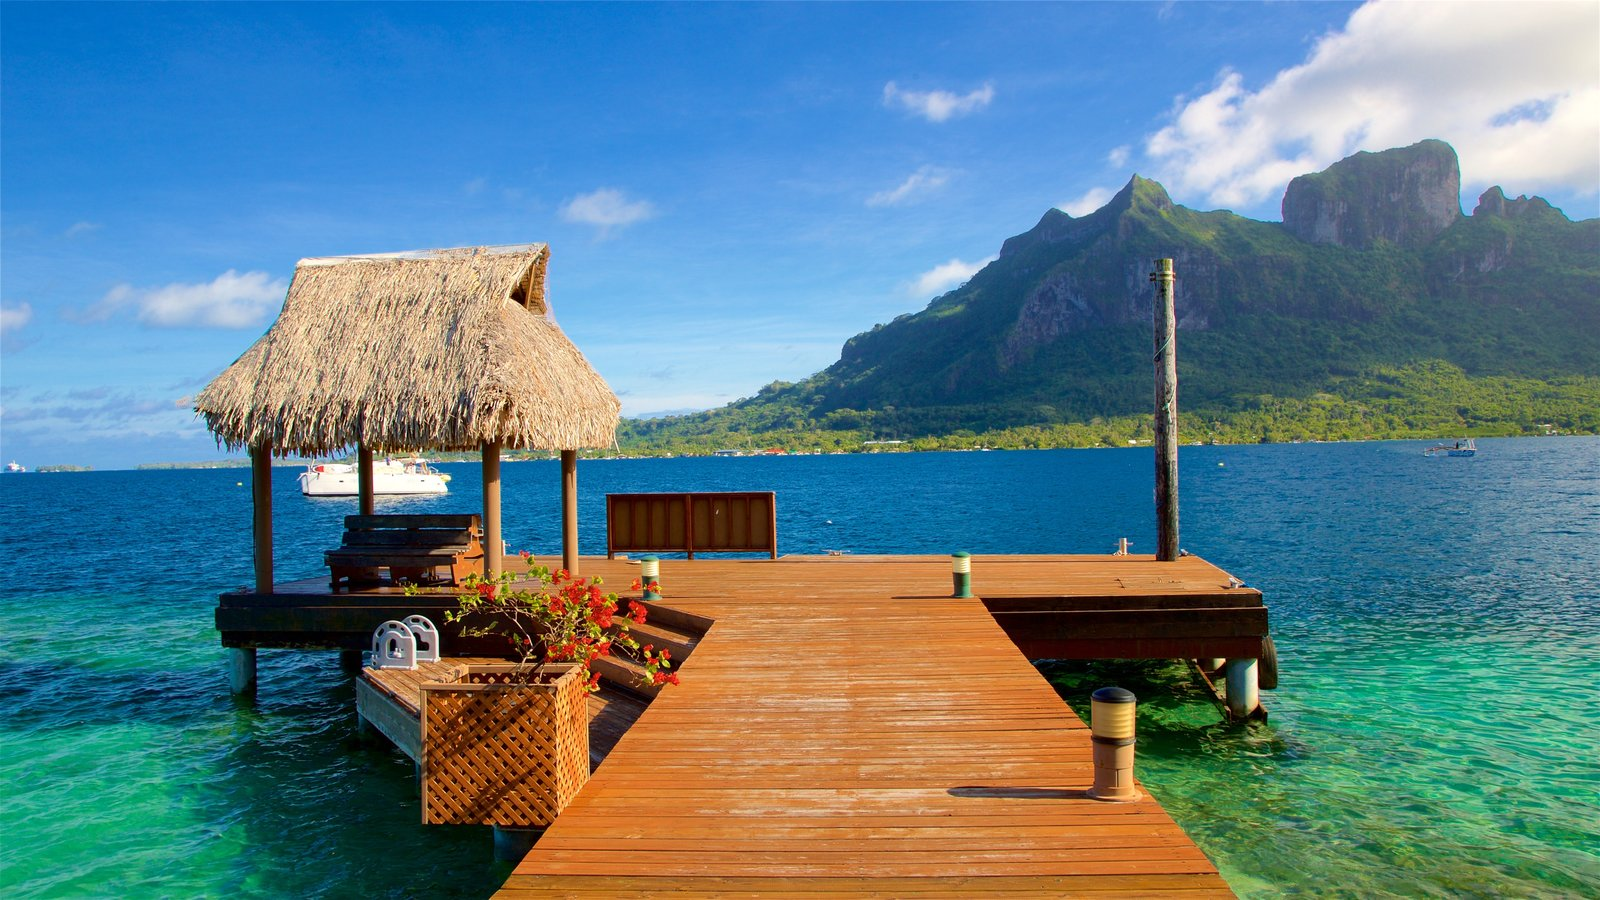 Bora Bora featuring general coastal views, mountains and tropical scenes